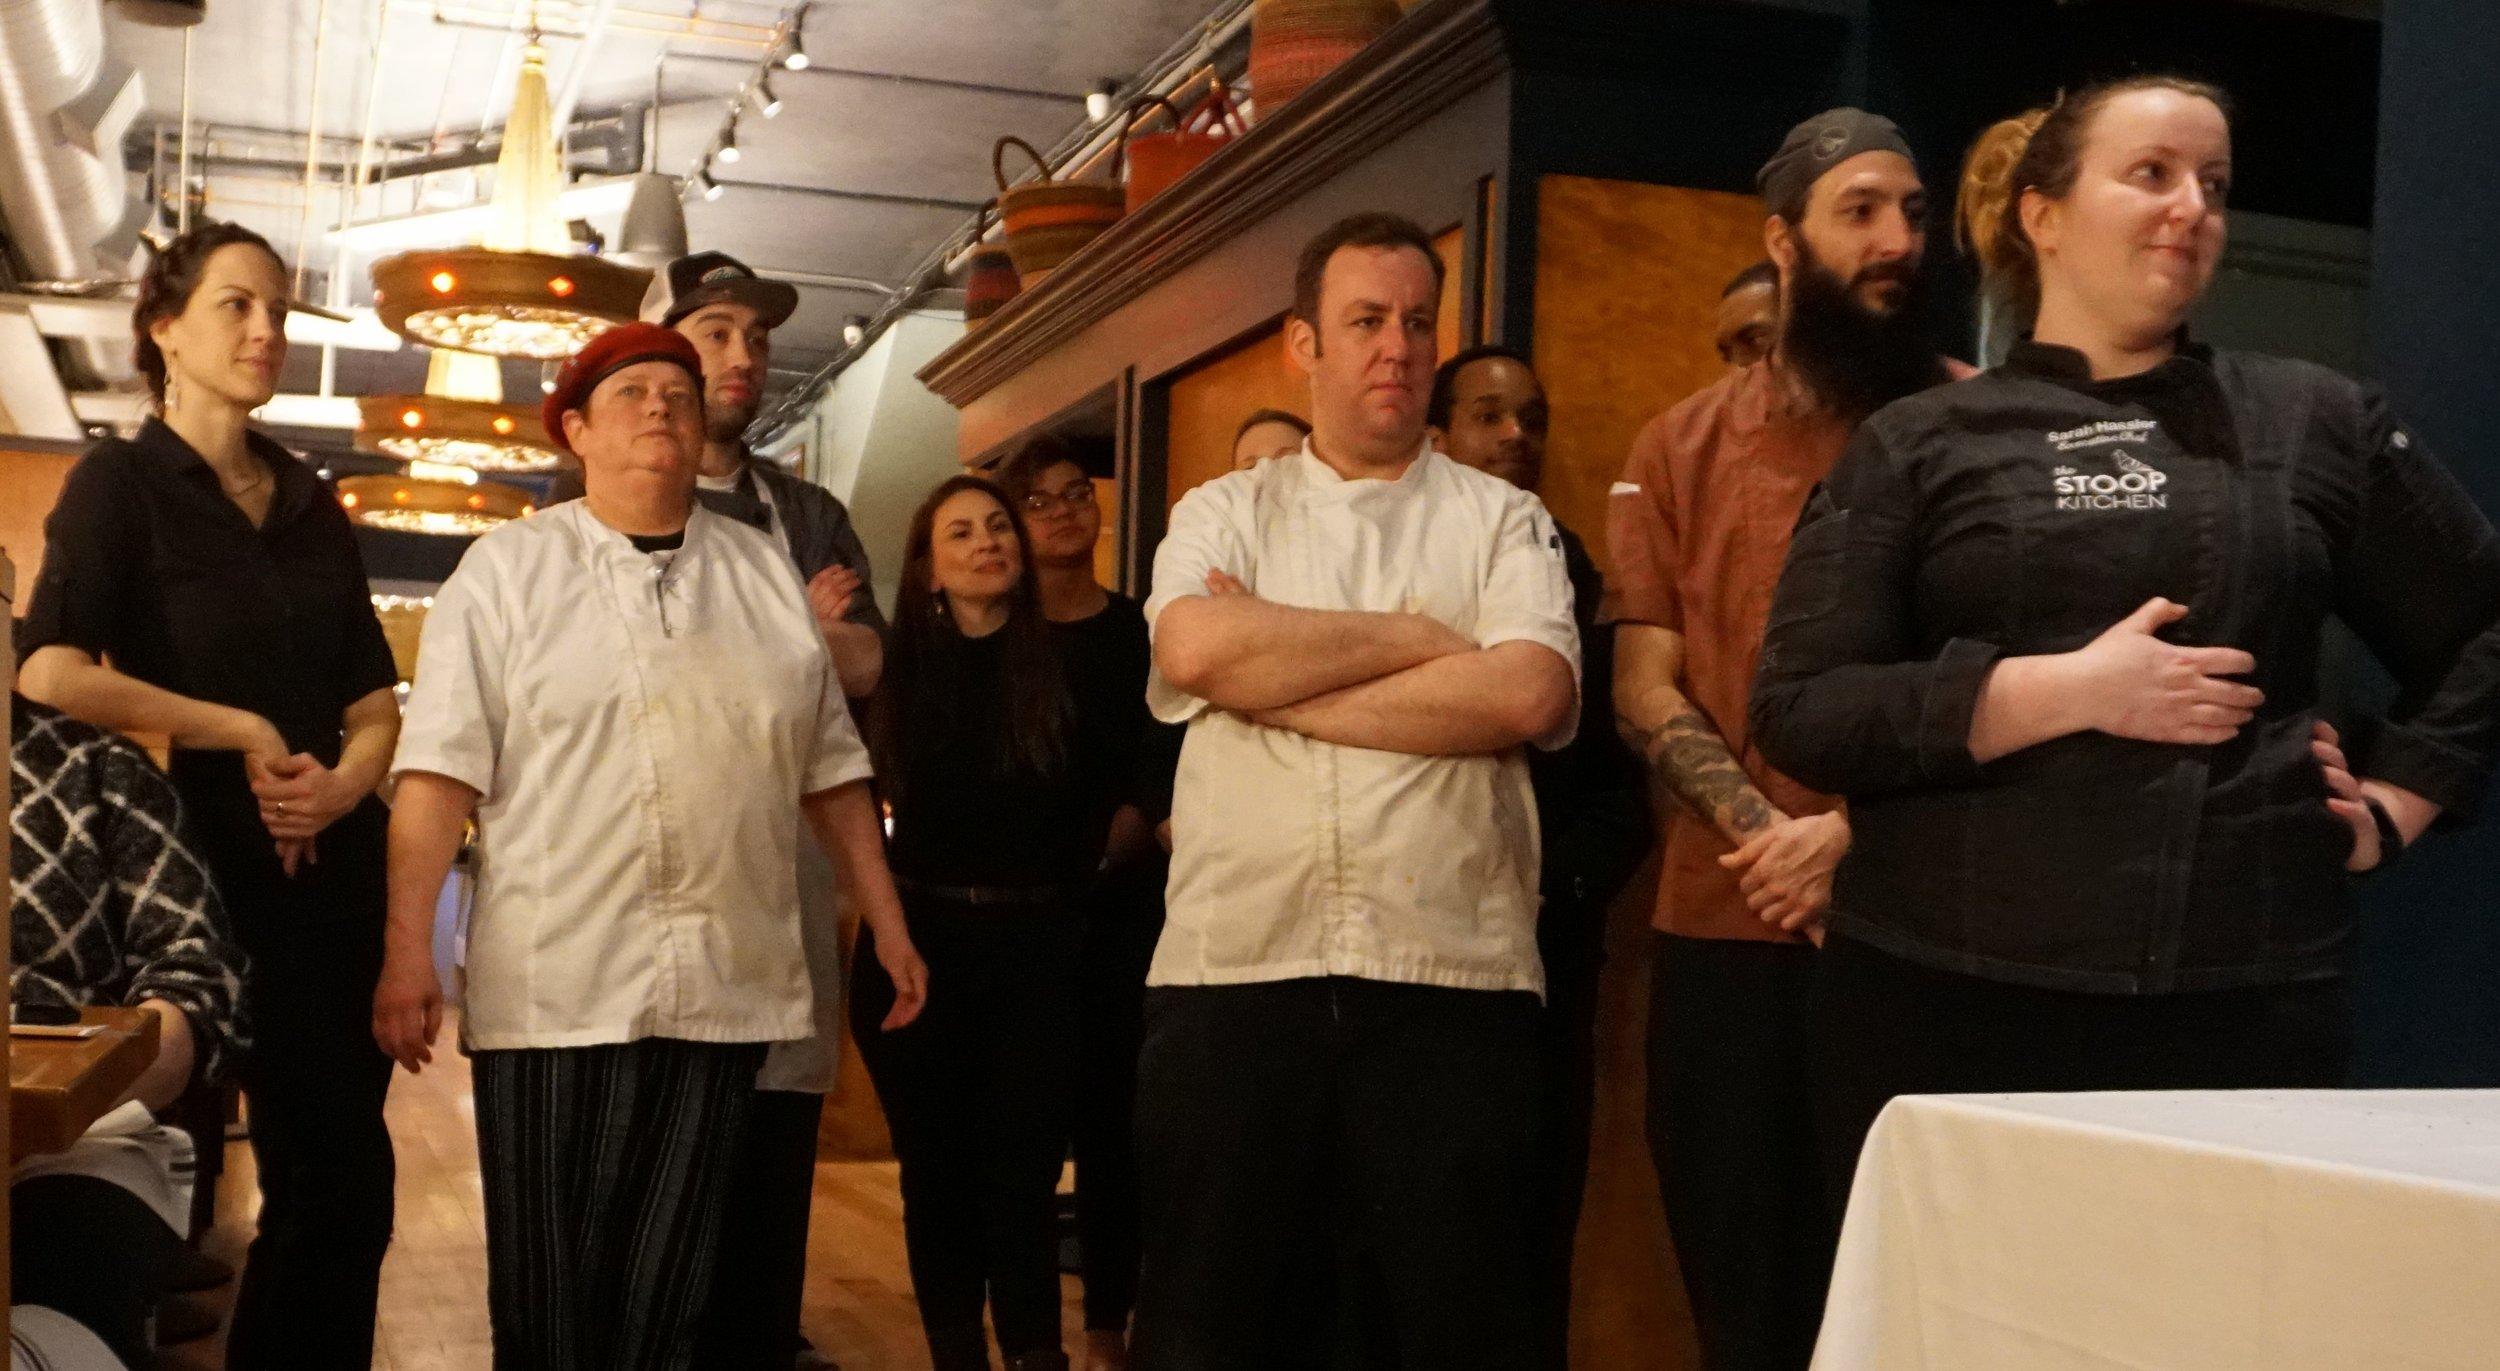 The Stoop Kitchen Team and Mario Gorea